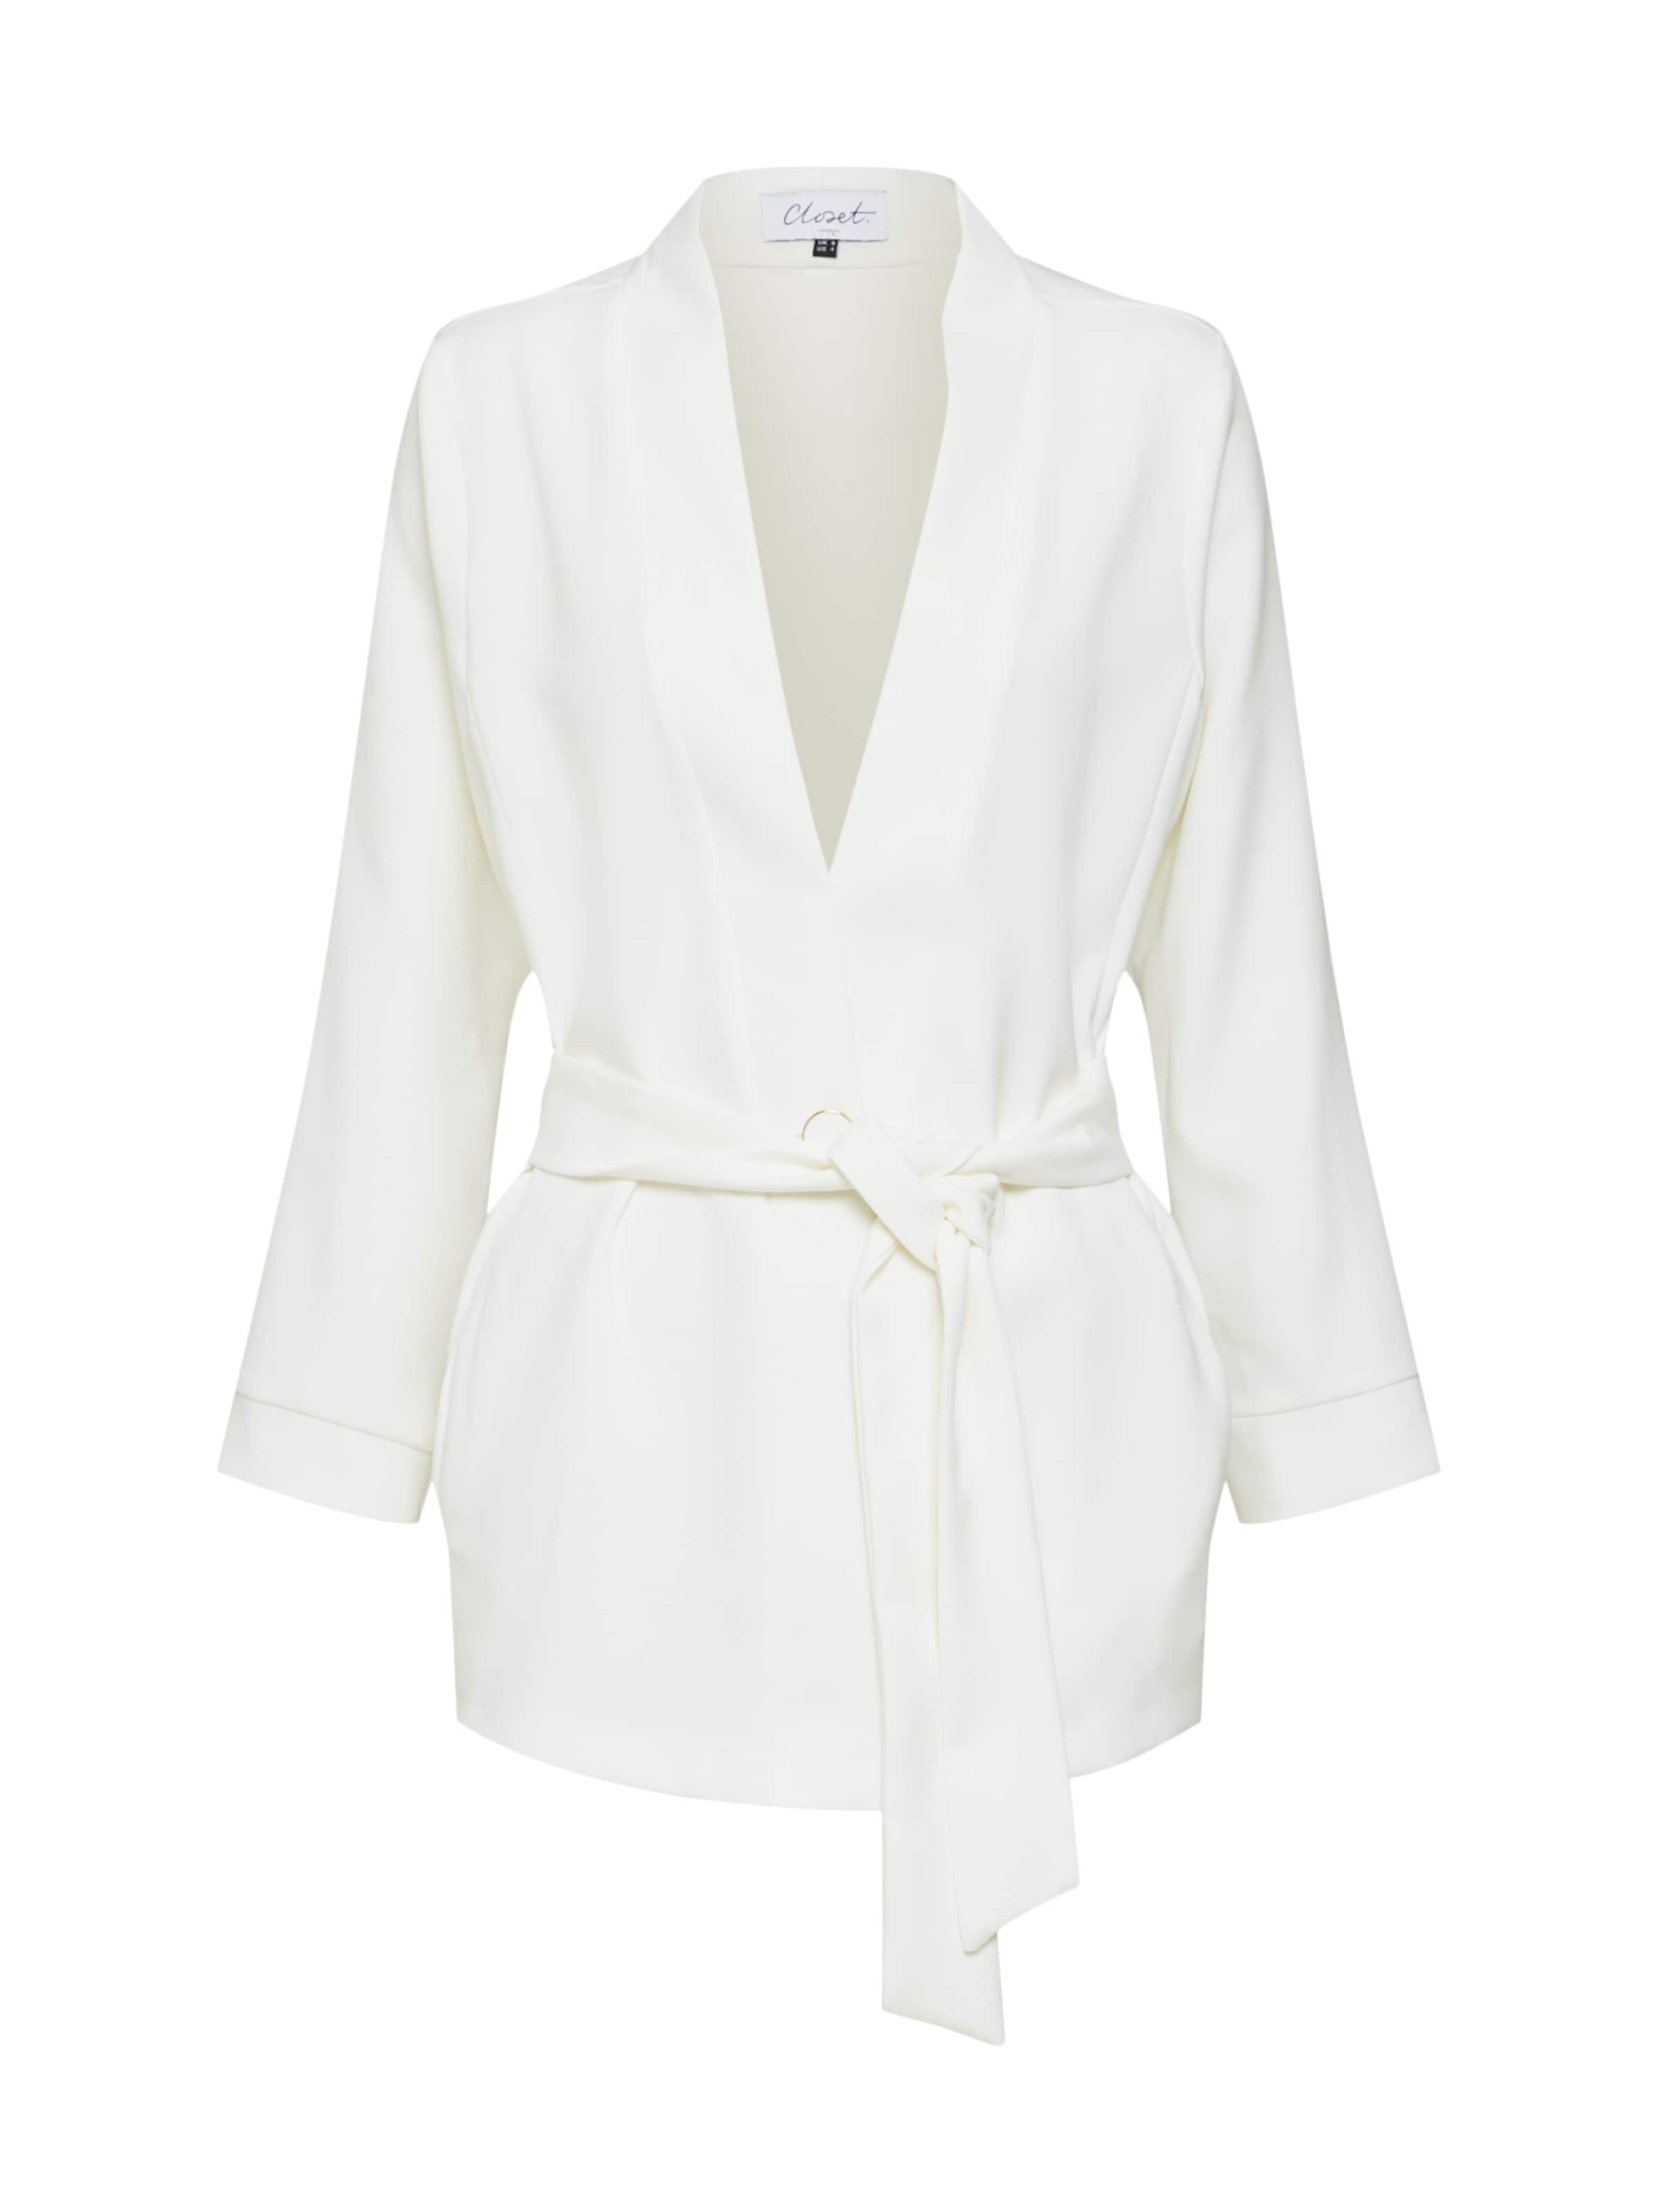 Cassé London Closet Blazer En Blanc nwN8OP0kXZ